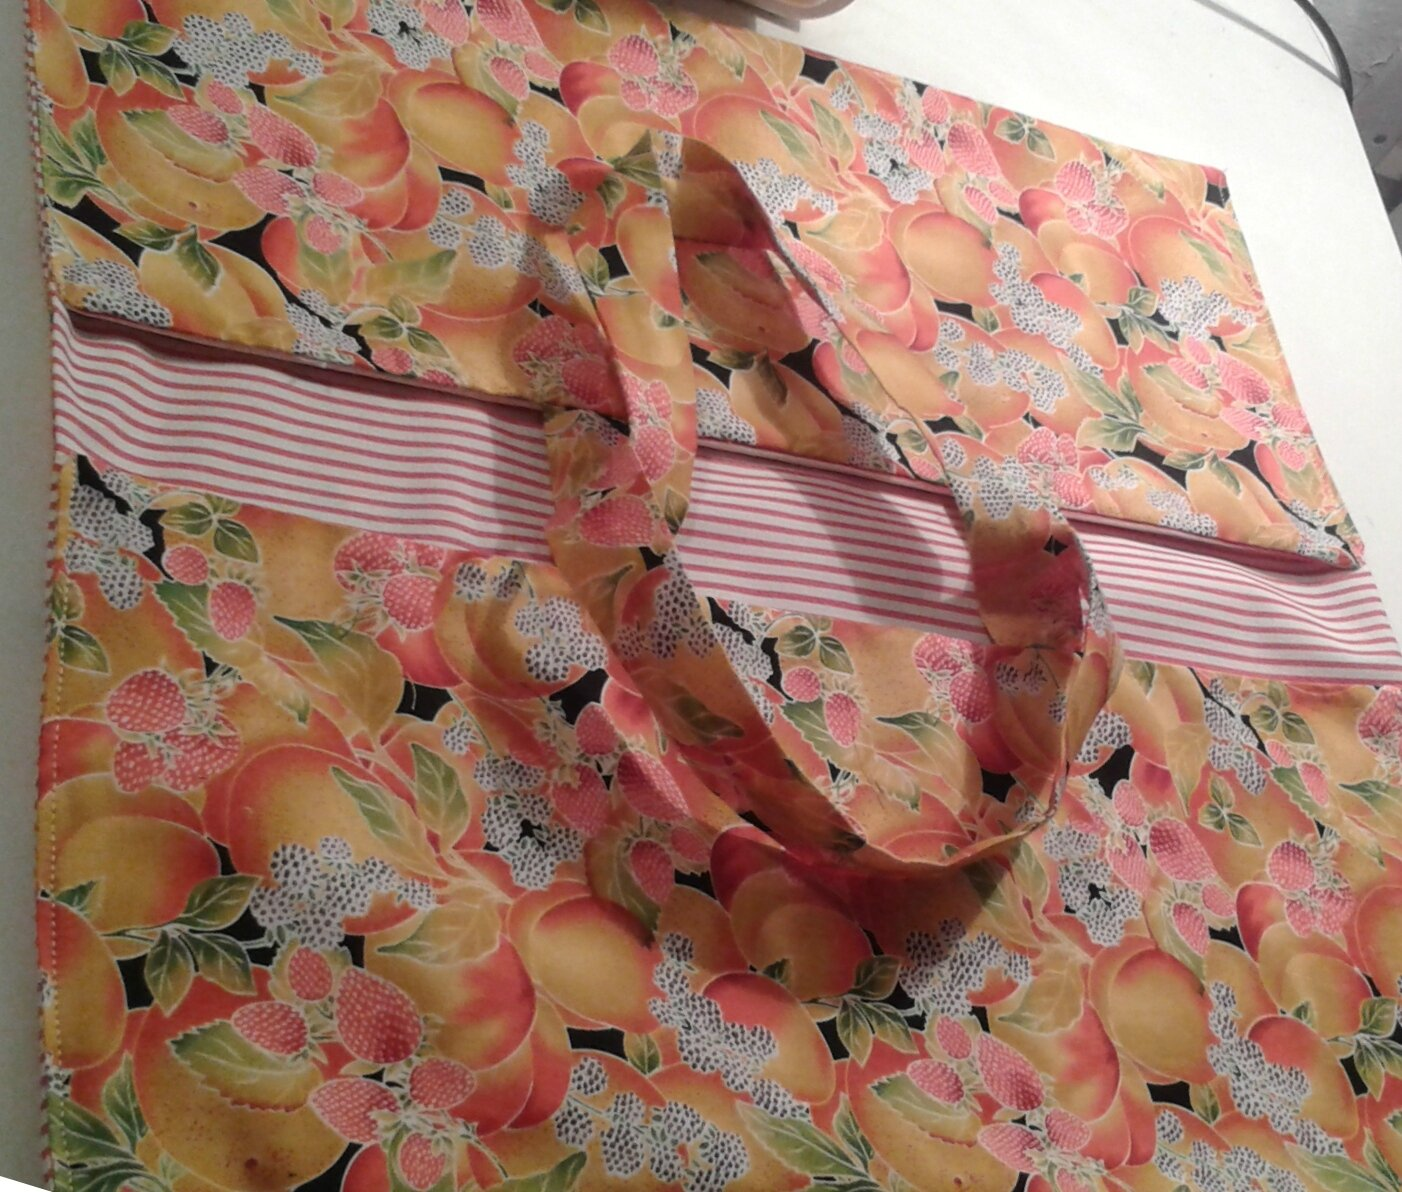 sac porte tarte la casa de marie coutures cr atives. Black Bedroom Furniture Sets. Home Design Ideas